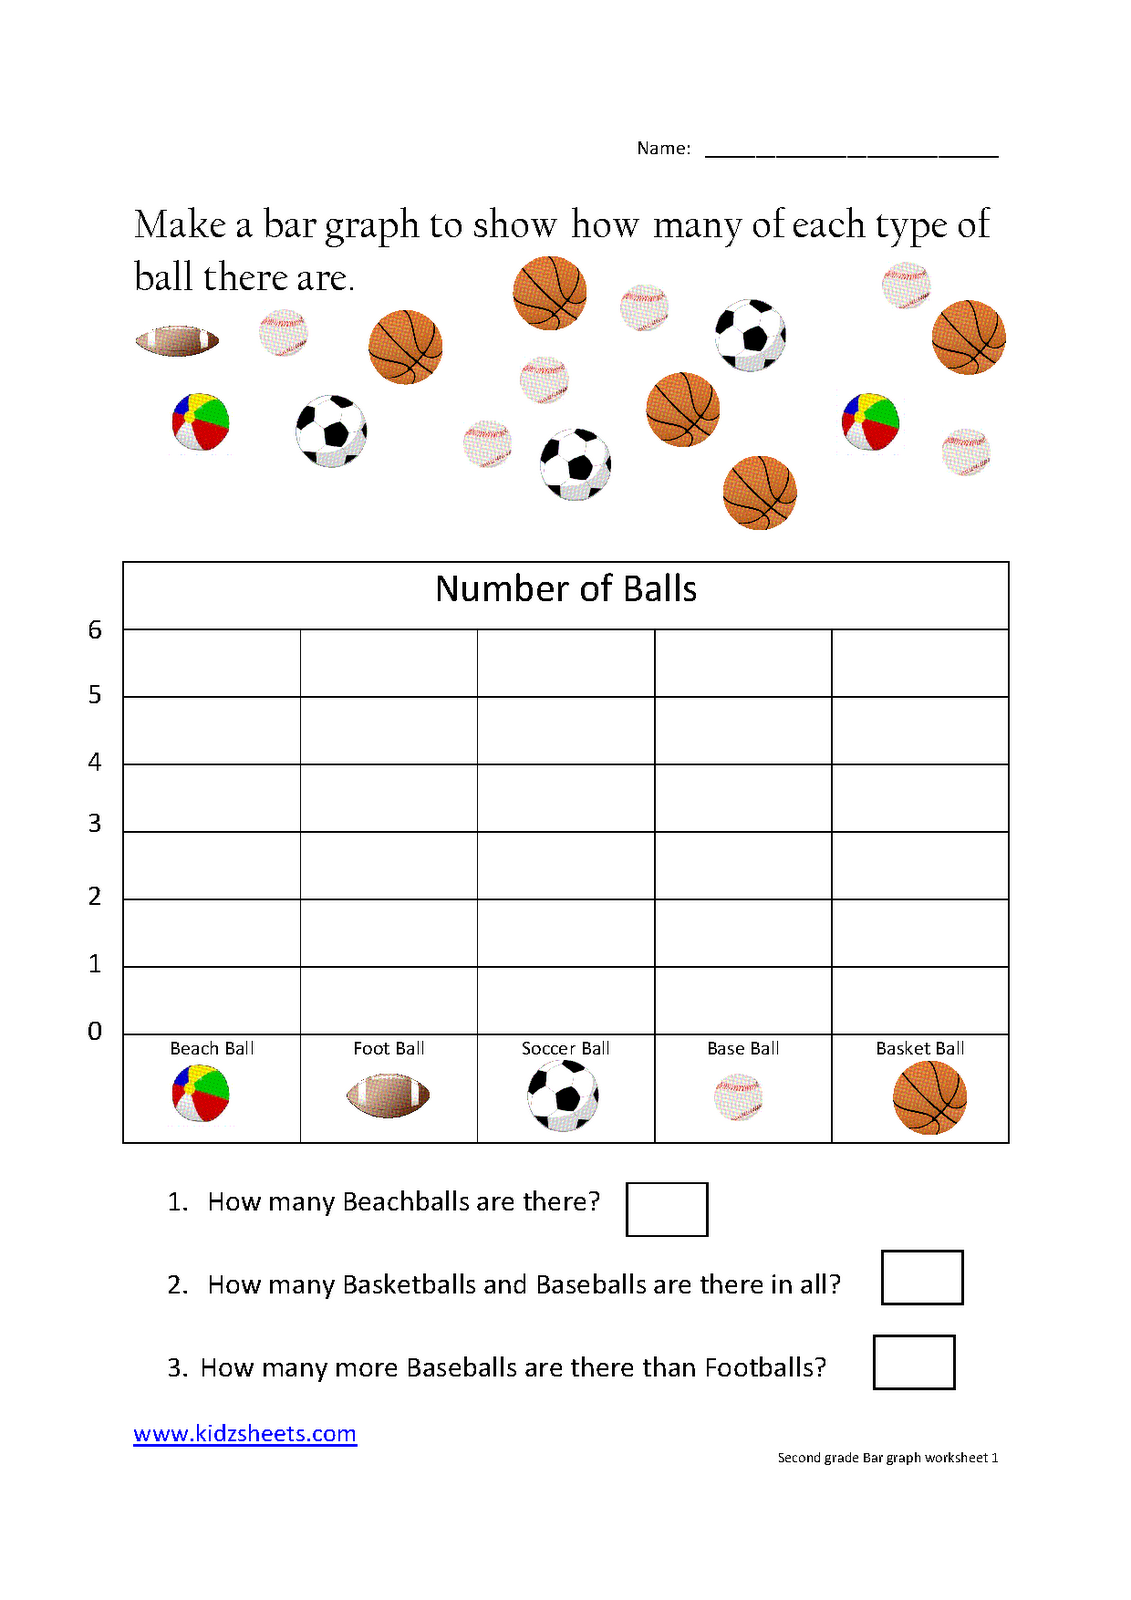 Kidz Worksheets: Second Grade Bar Graph Worksheet1   Kids math worksheets [ 1600 x 1131 Pixel ]